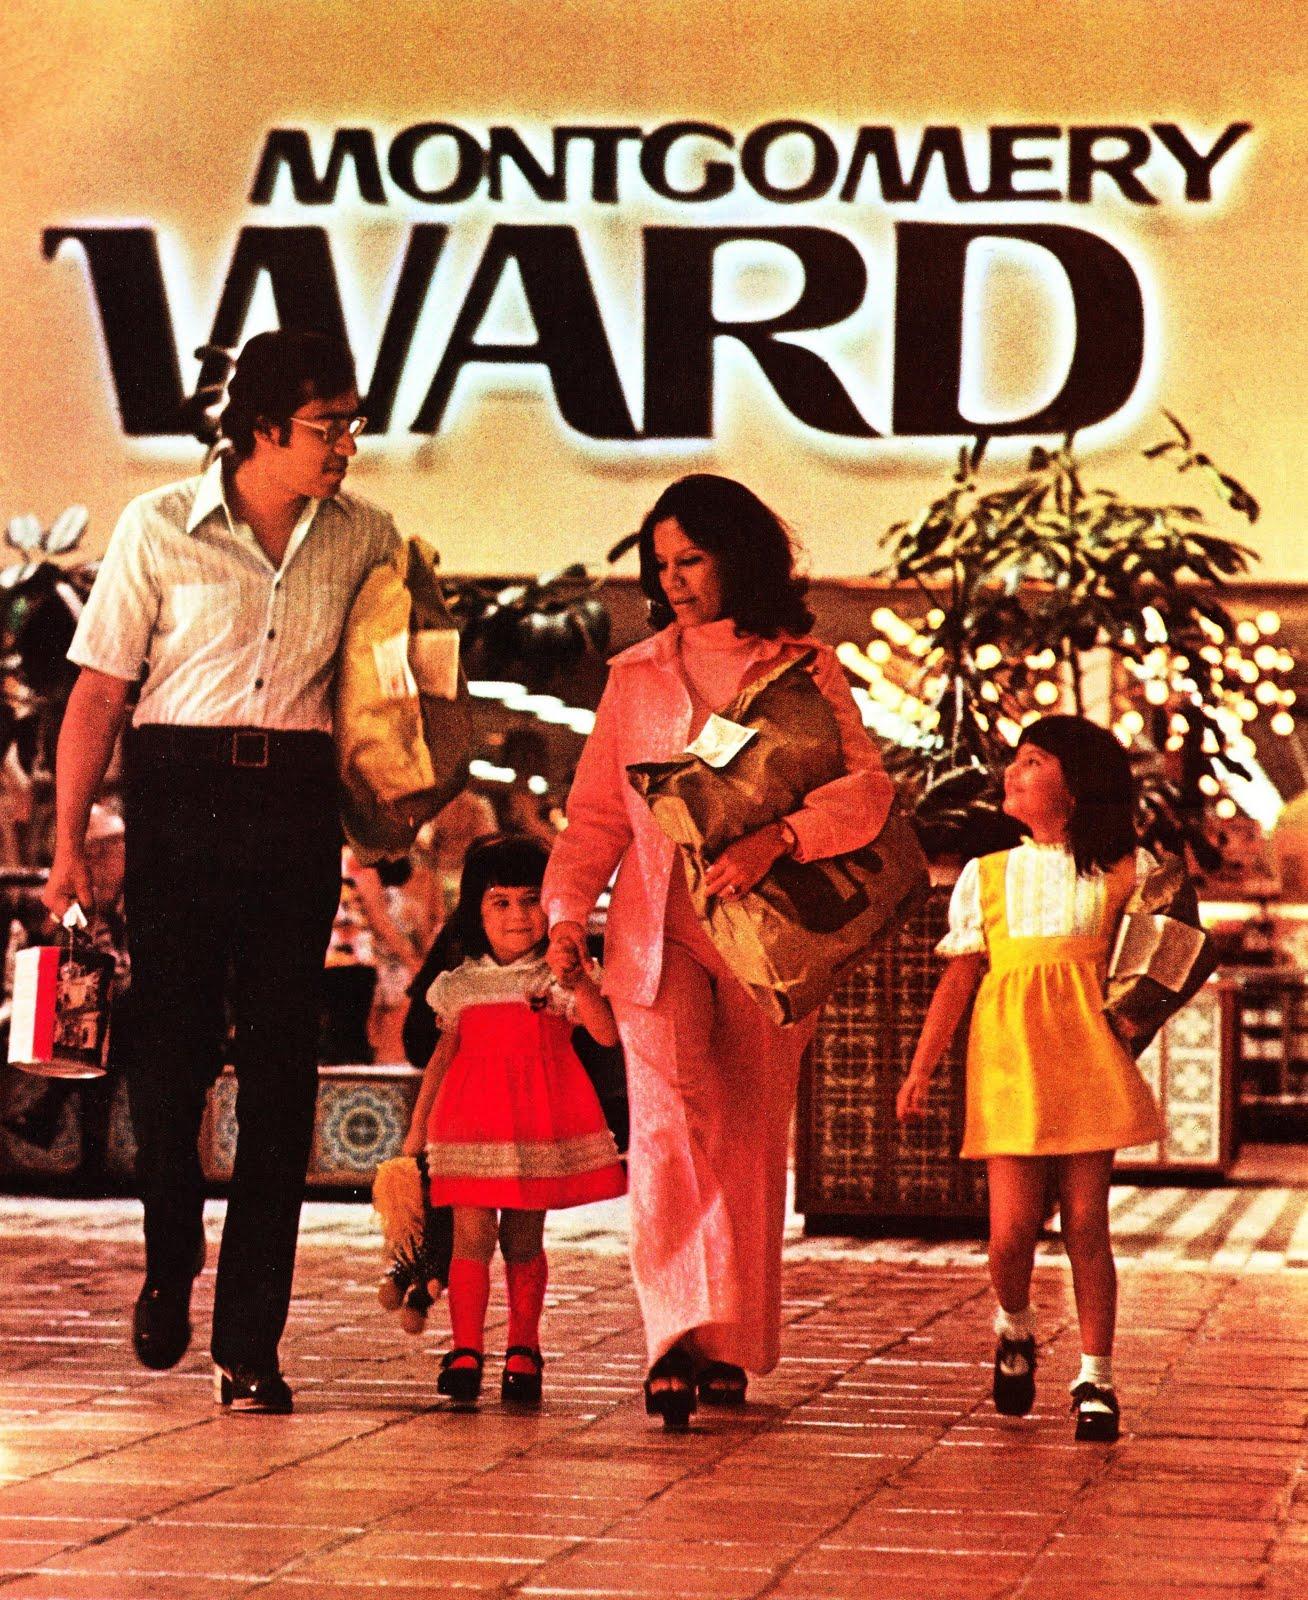 Filename: montgomery ward 1974a pleasantfamilyshopping.jpg